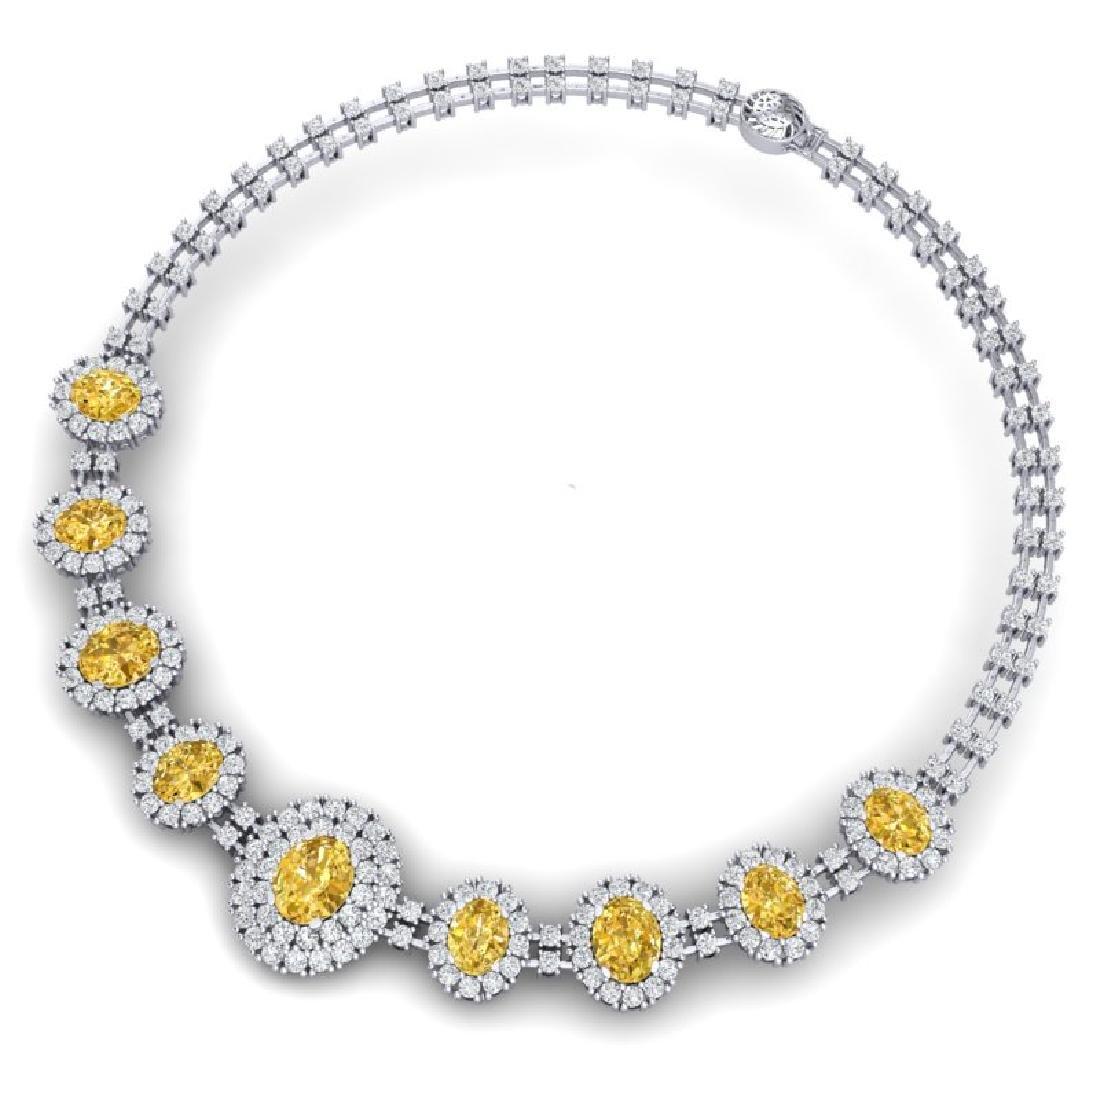 43.20 CTW Royalty Canary Citrine & VS Diamond Necklace - 3